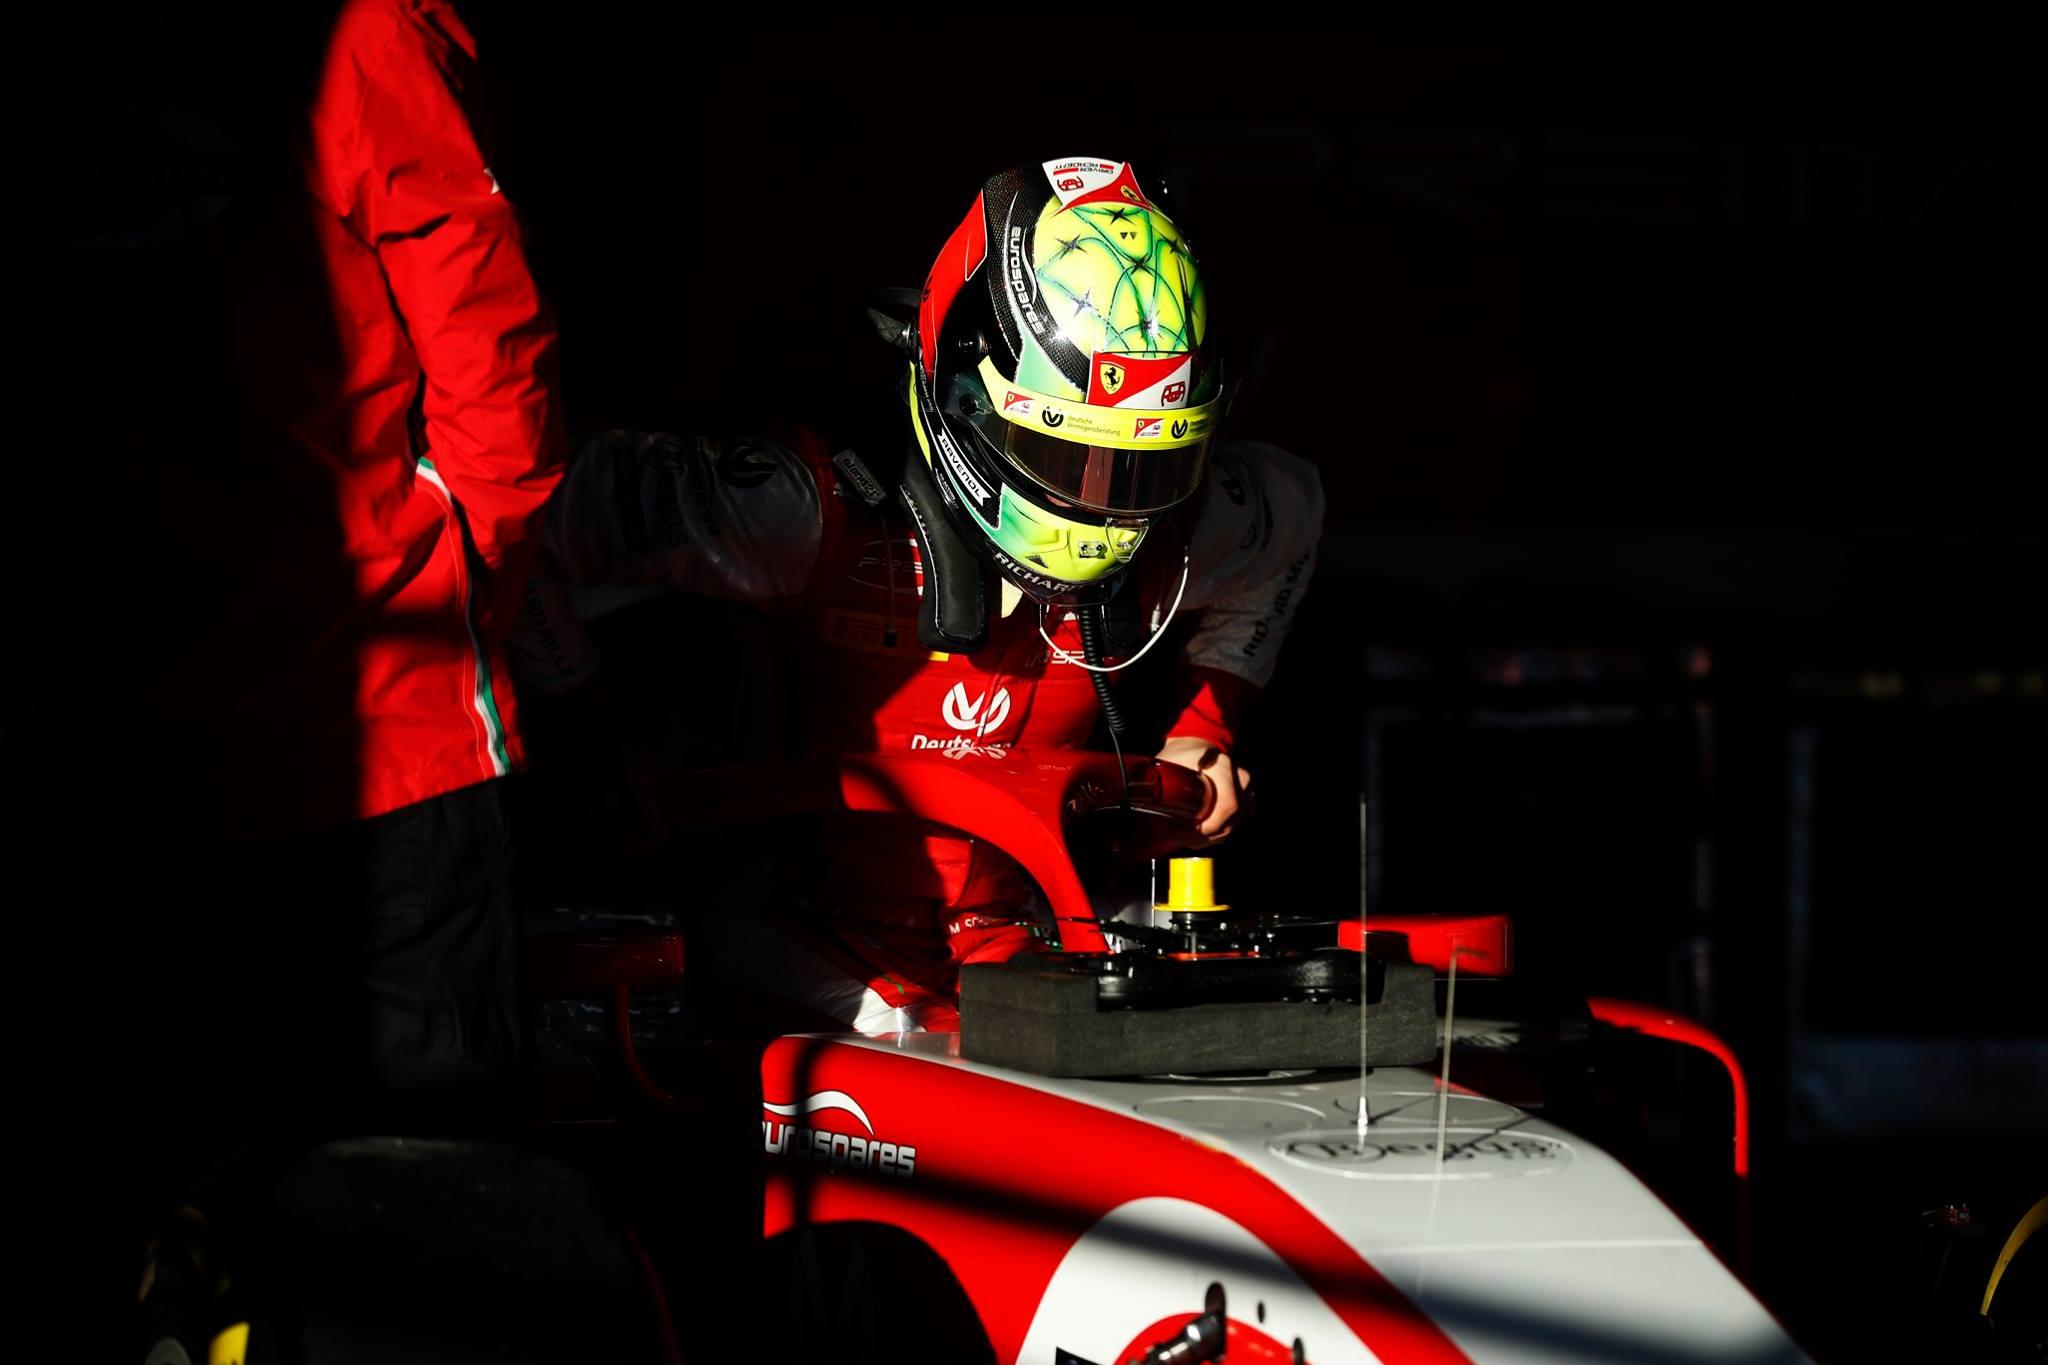 Mick Schumacher, Ferrari, Prema, F2